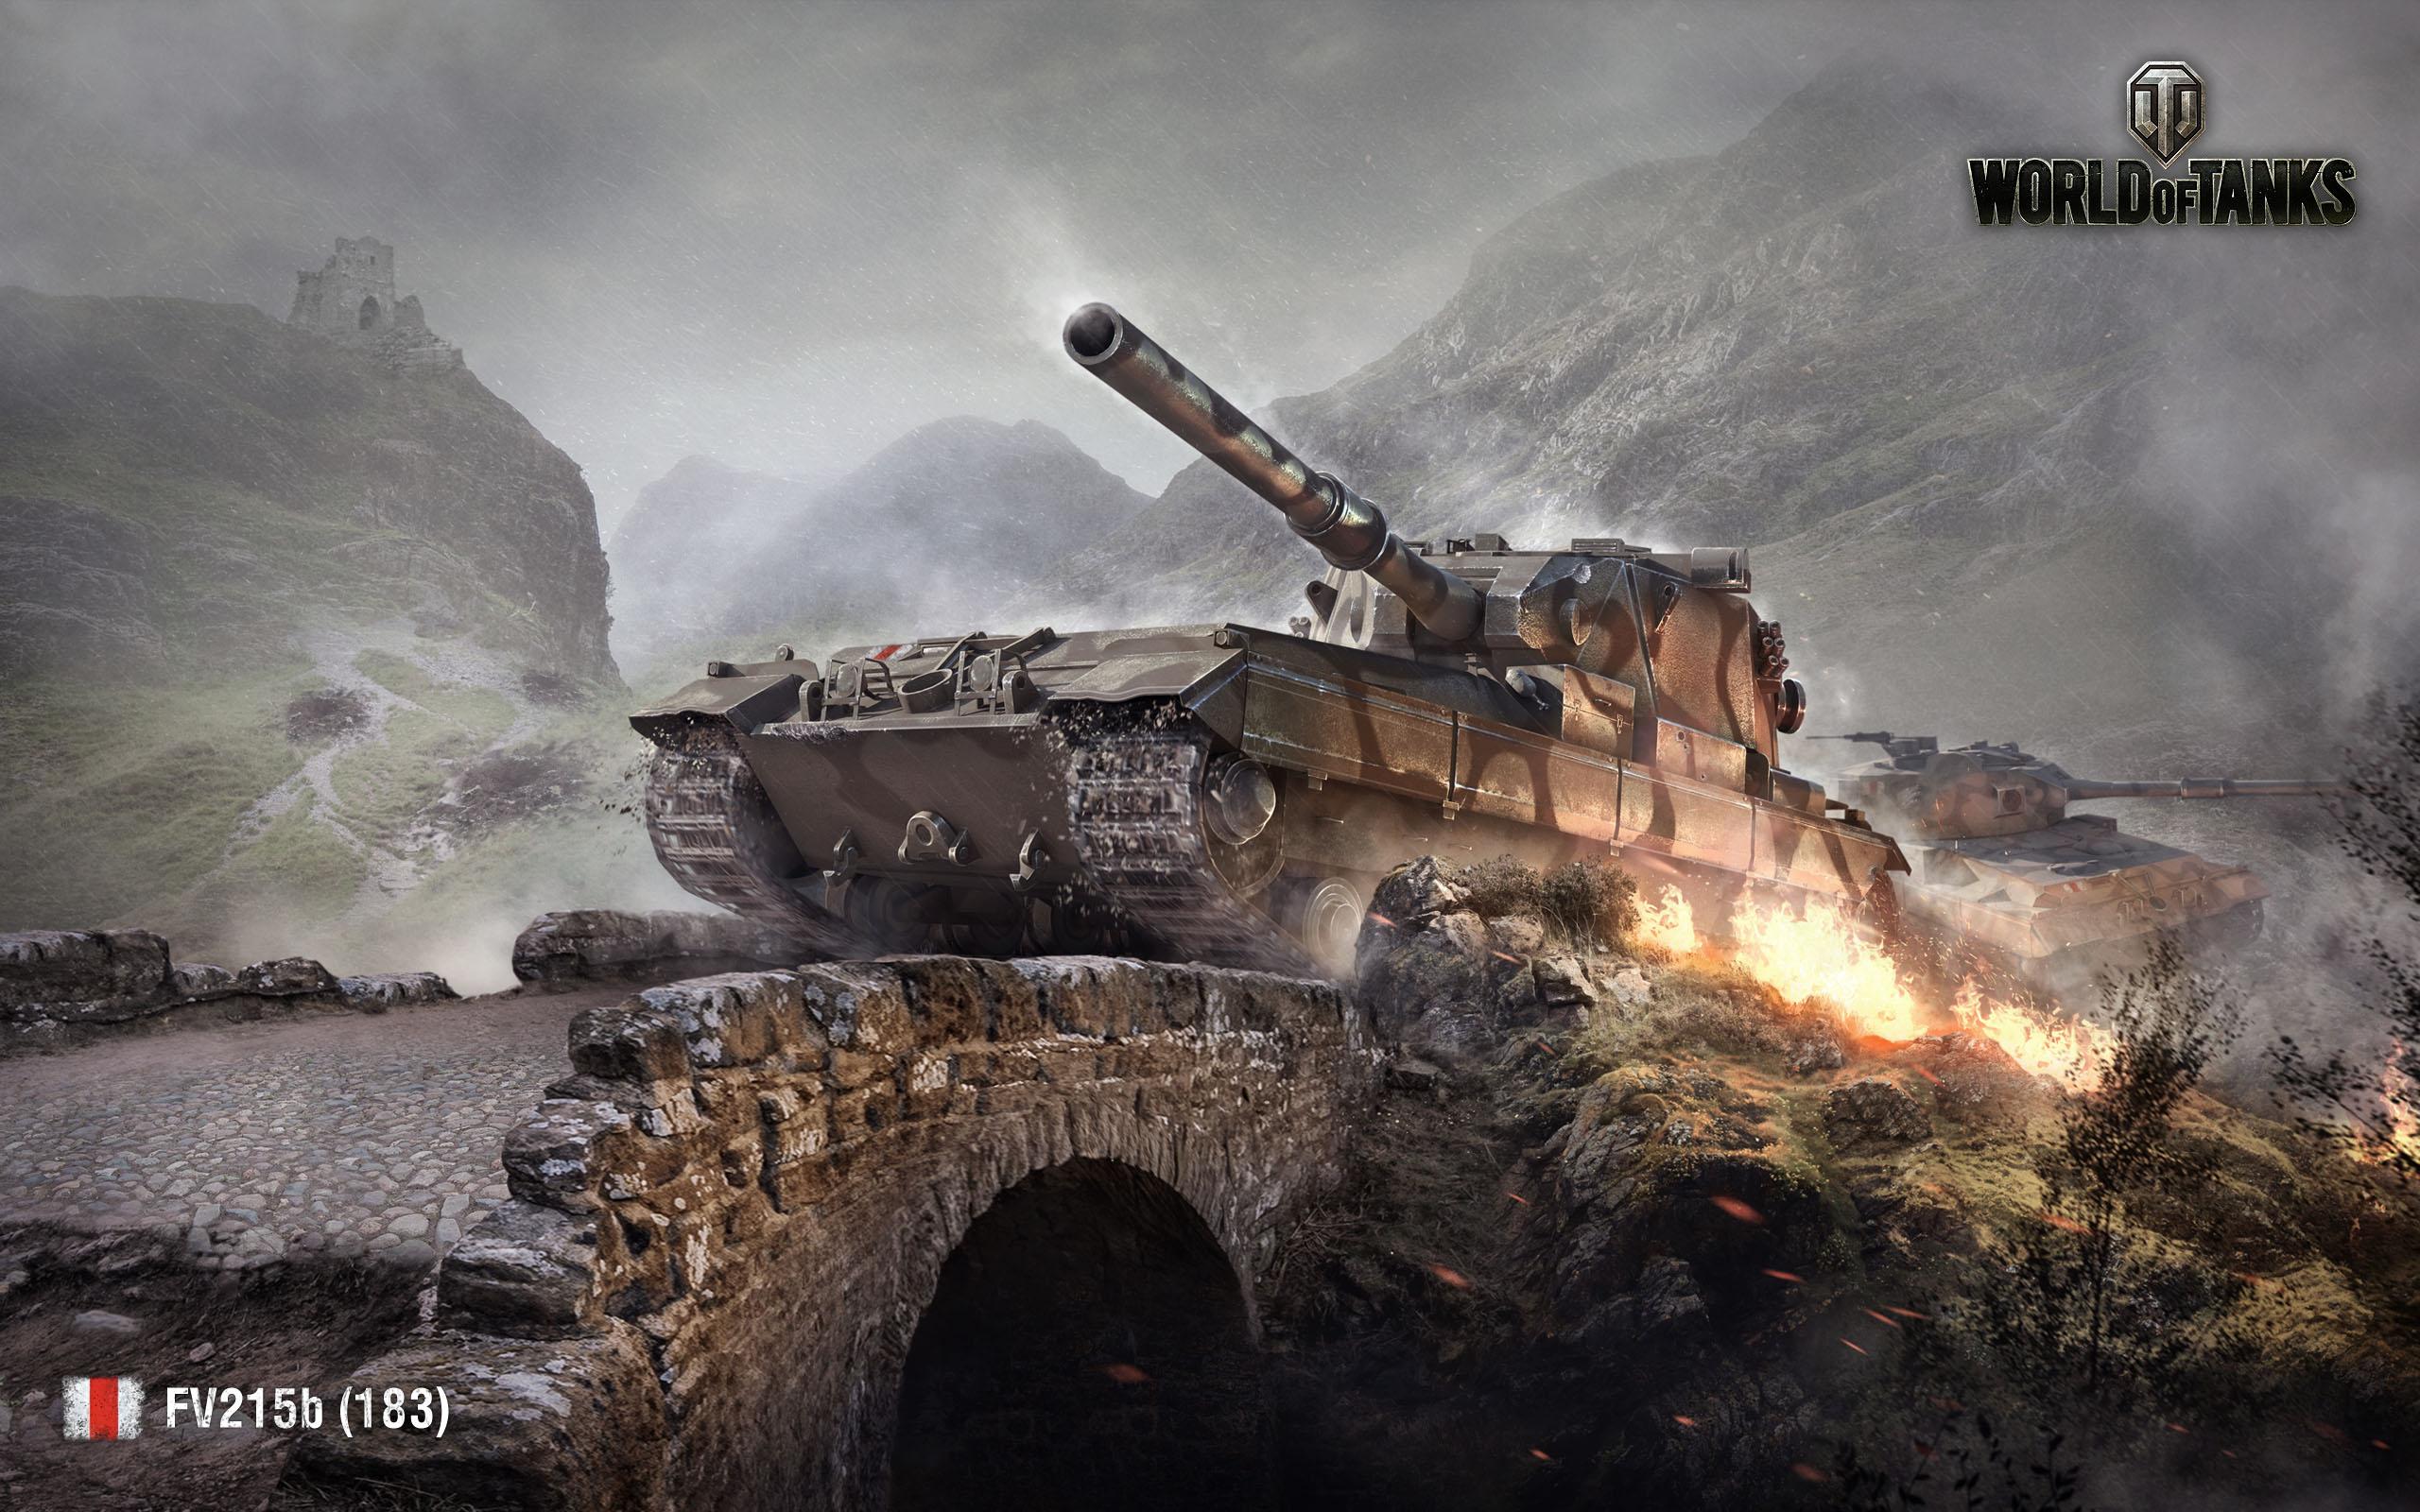 44 World Of Tanks Wallpaper Hd On Wallpapersafari